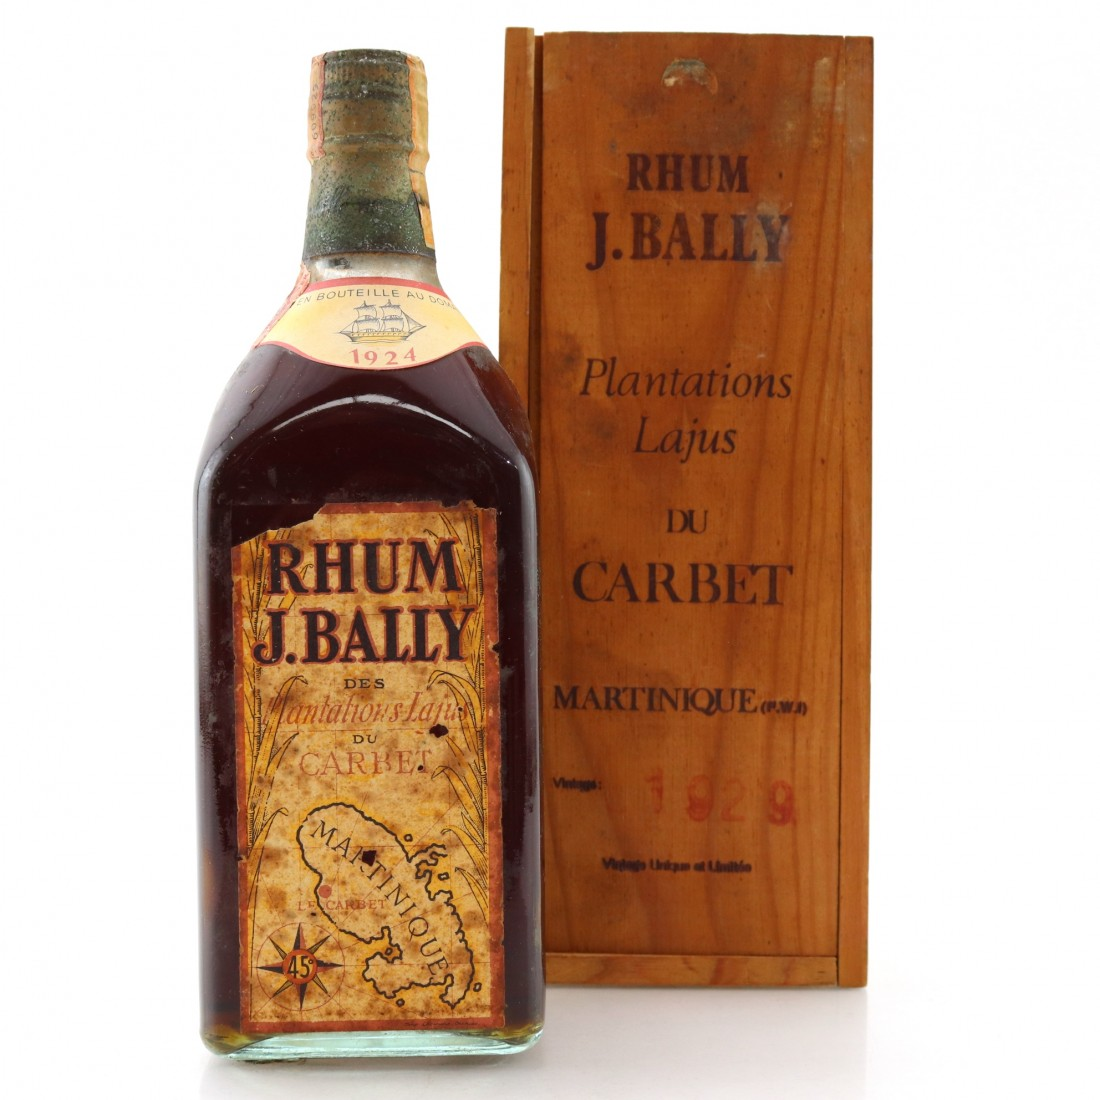 Rhum J. Bally 1924